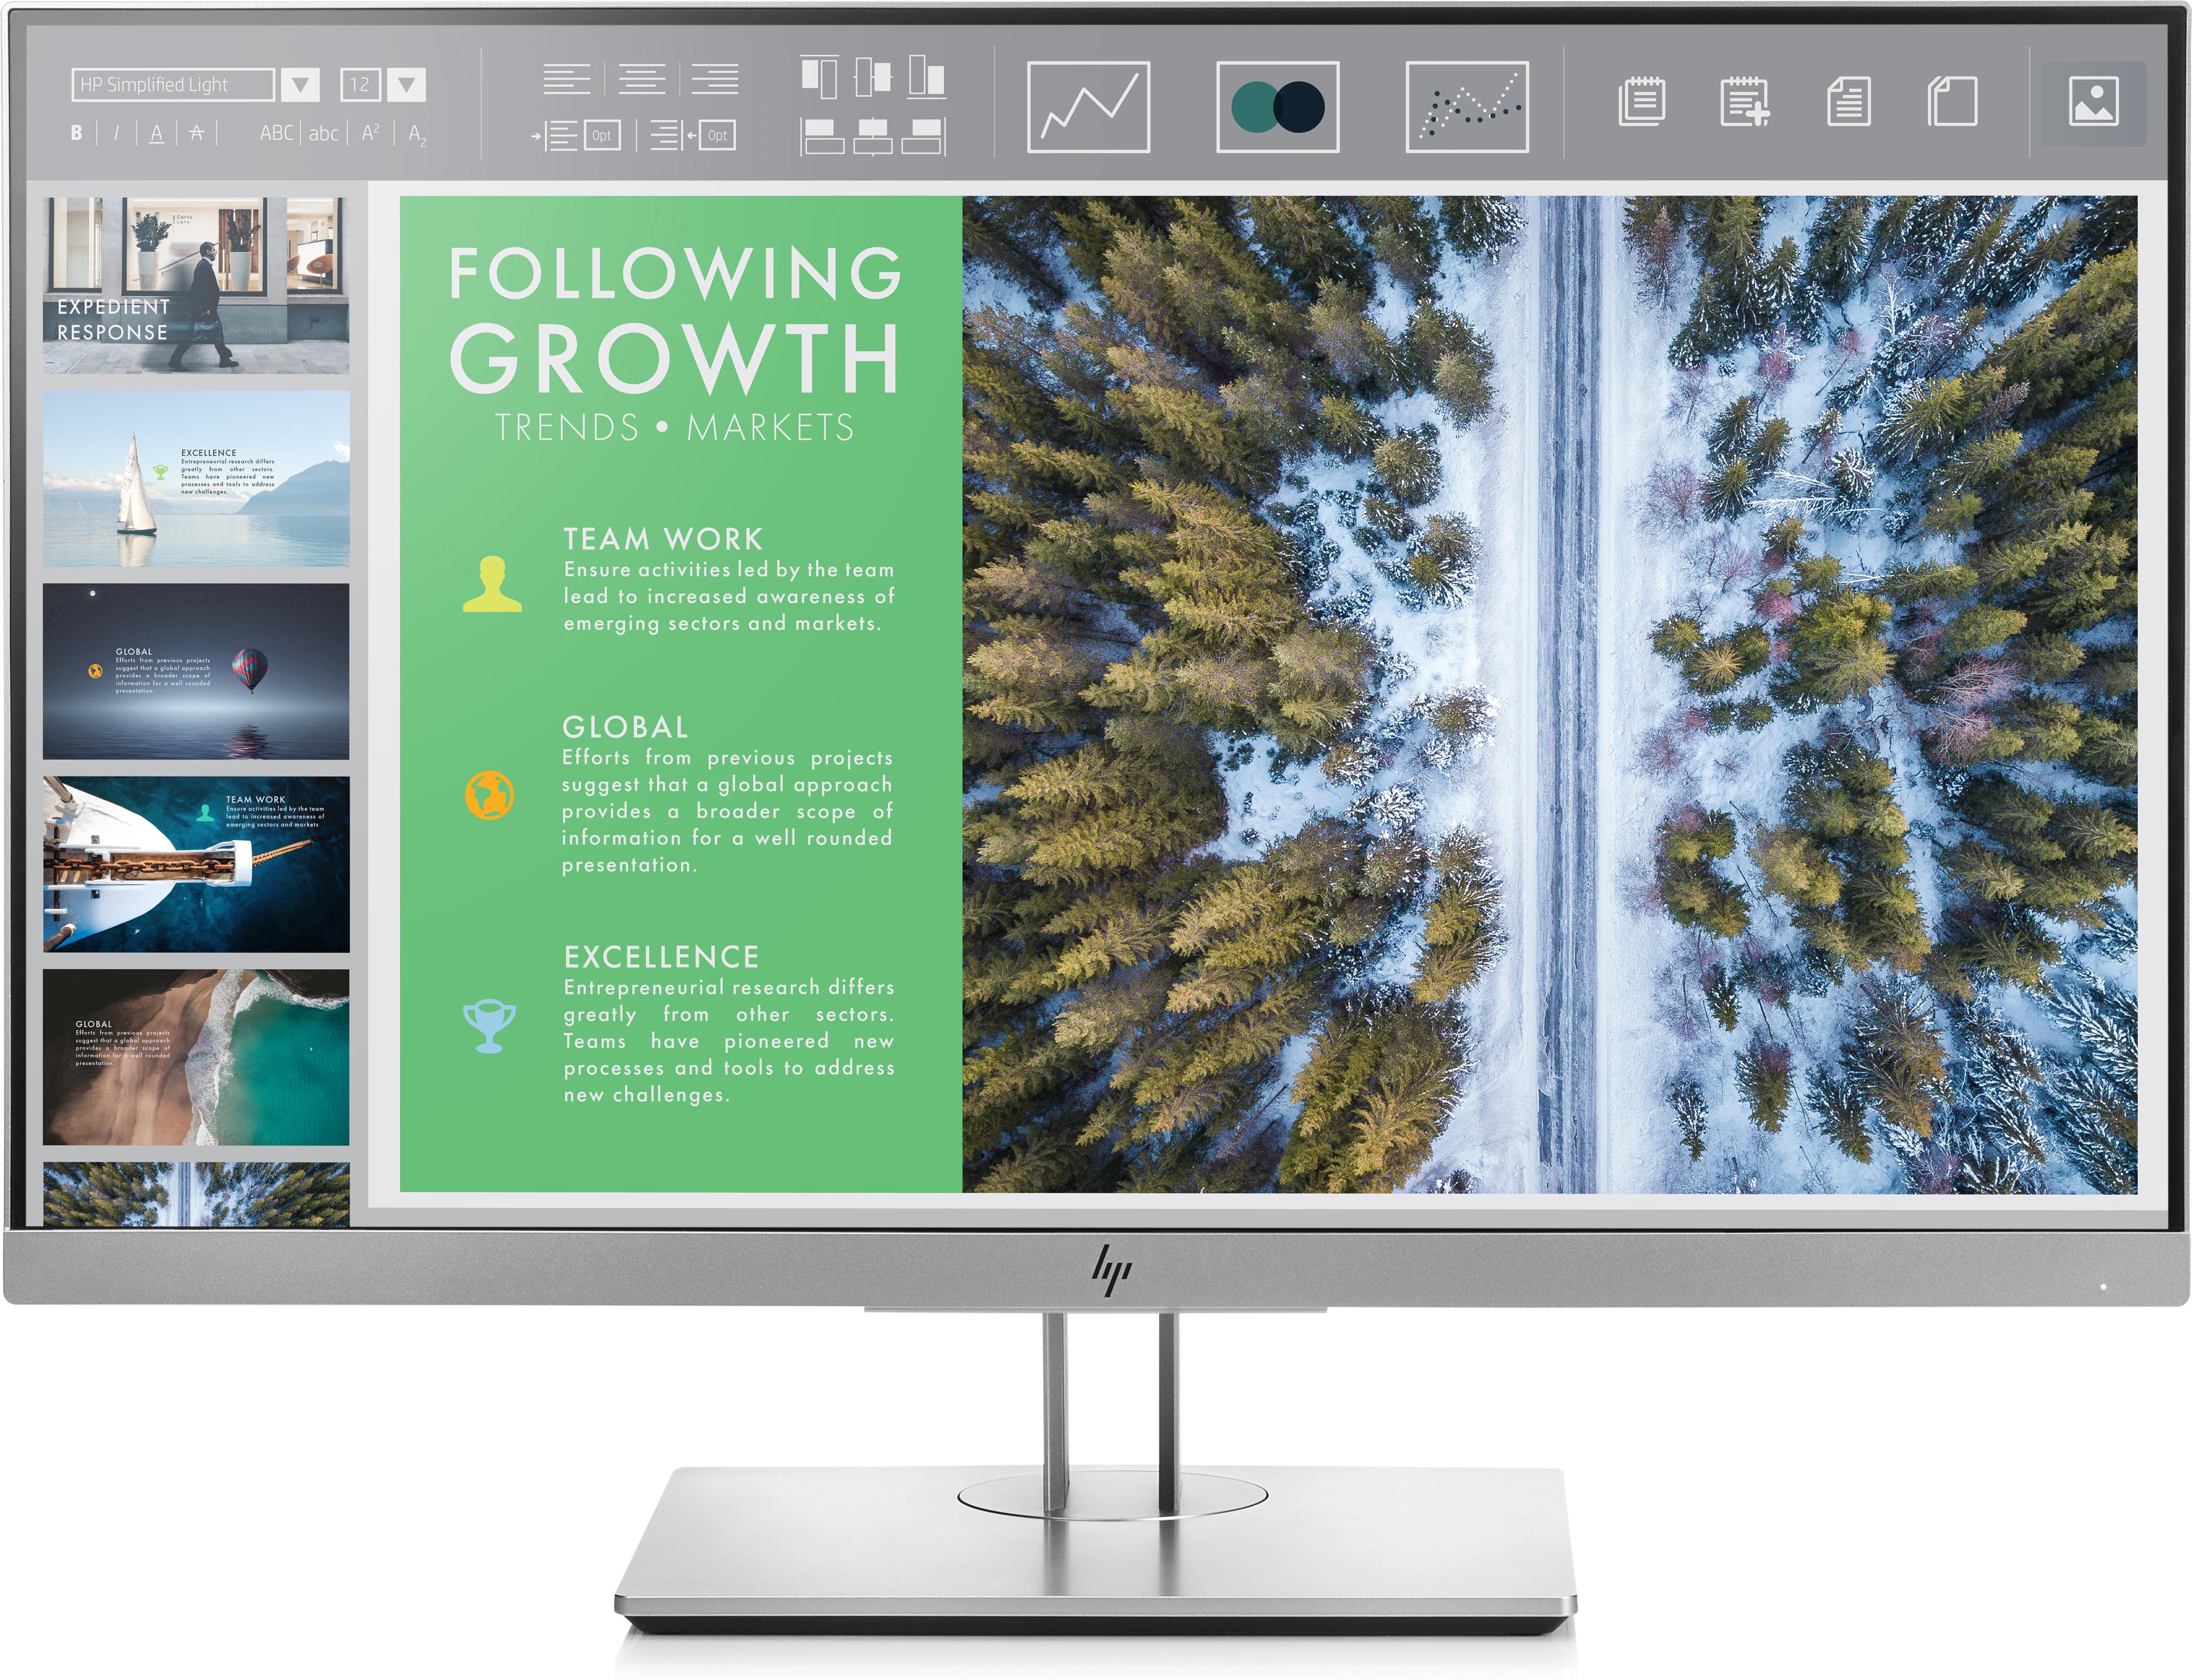 HP EliteDisplay E243 - 60,5 cm (23.8 Zoll) - 1920 x 1080 Pixel - Full HD - LED - 5 ms - Schwarz - Silber